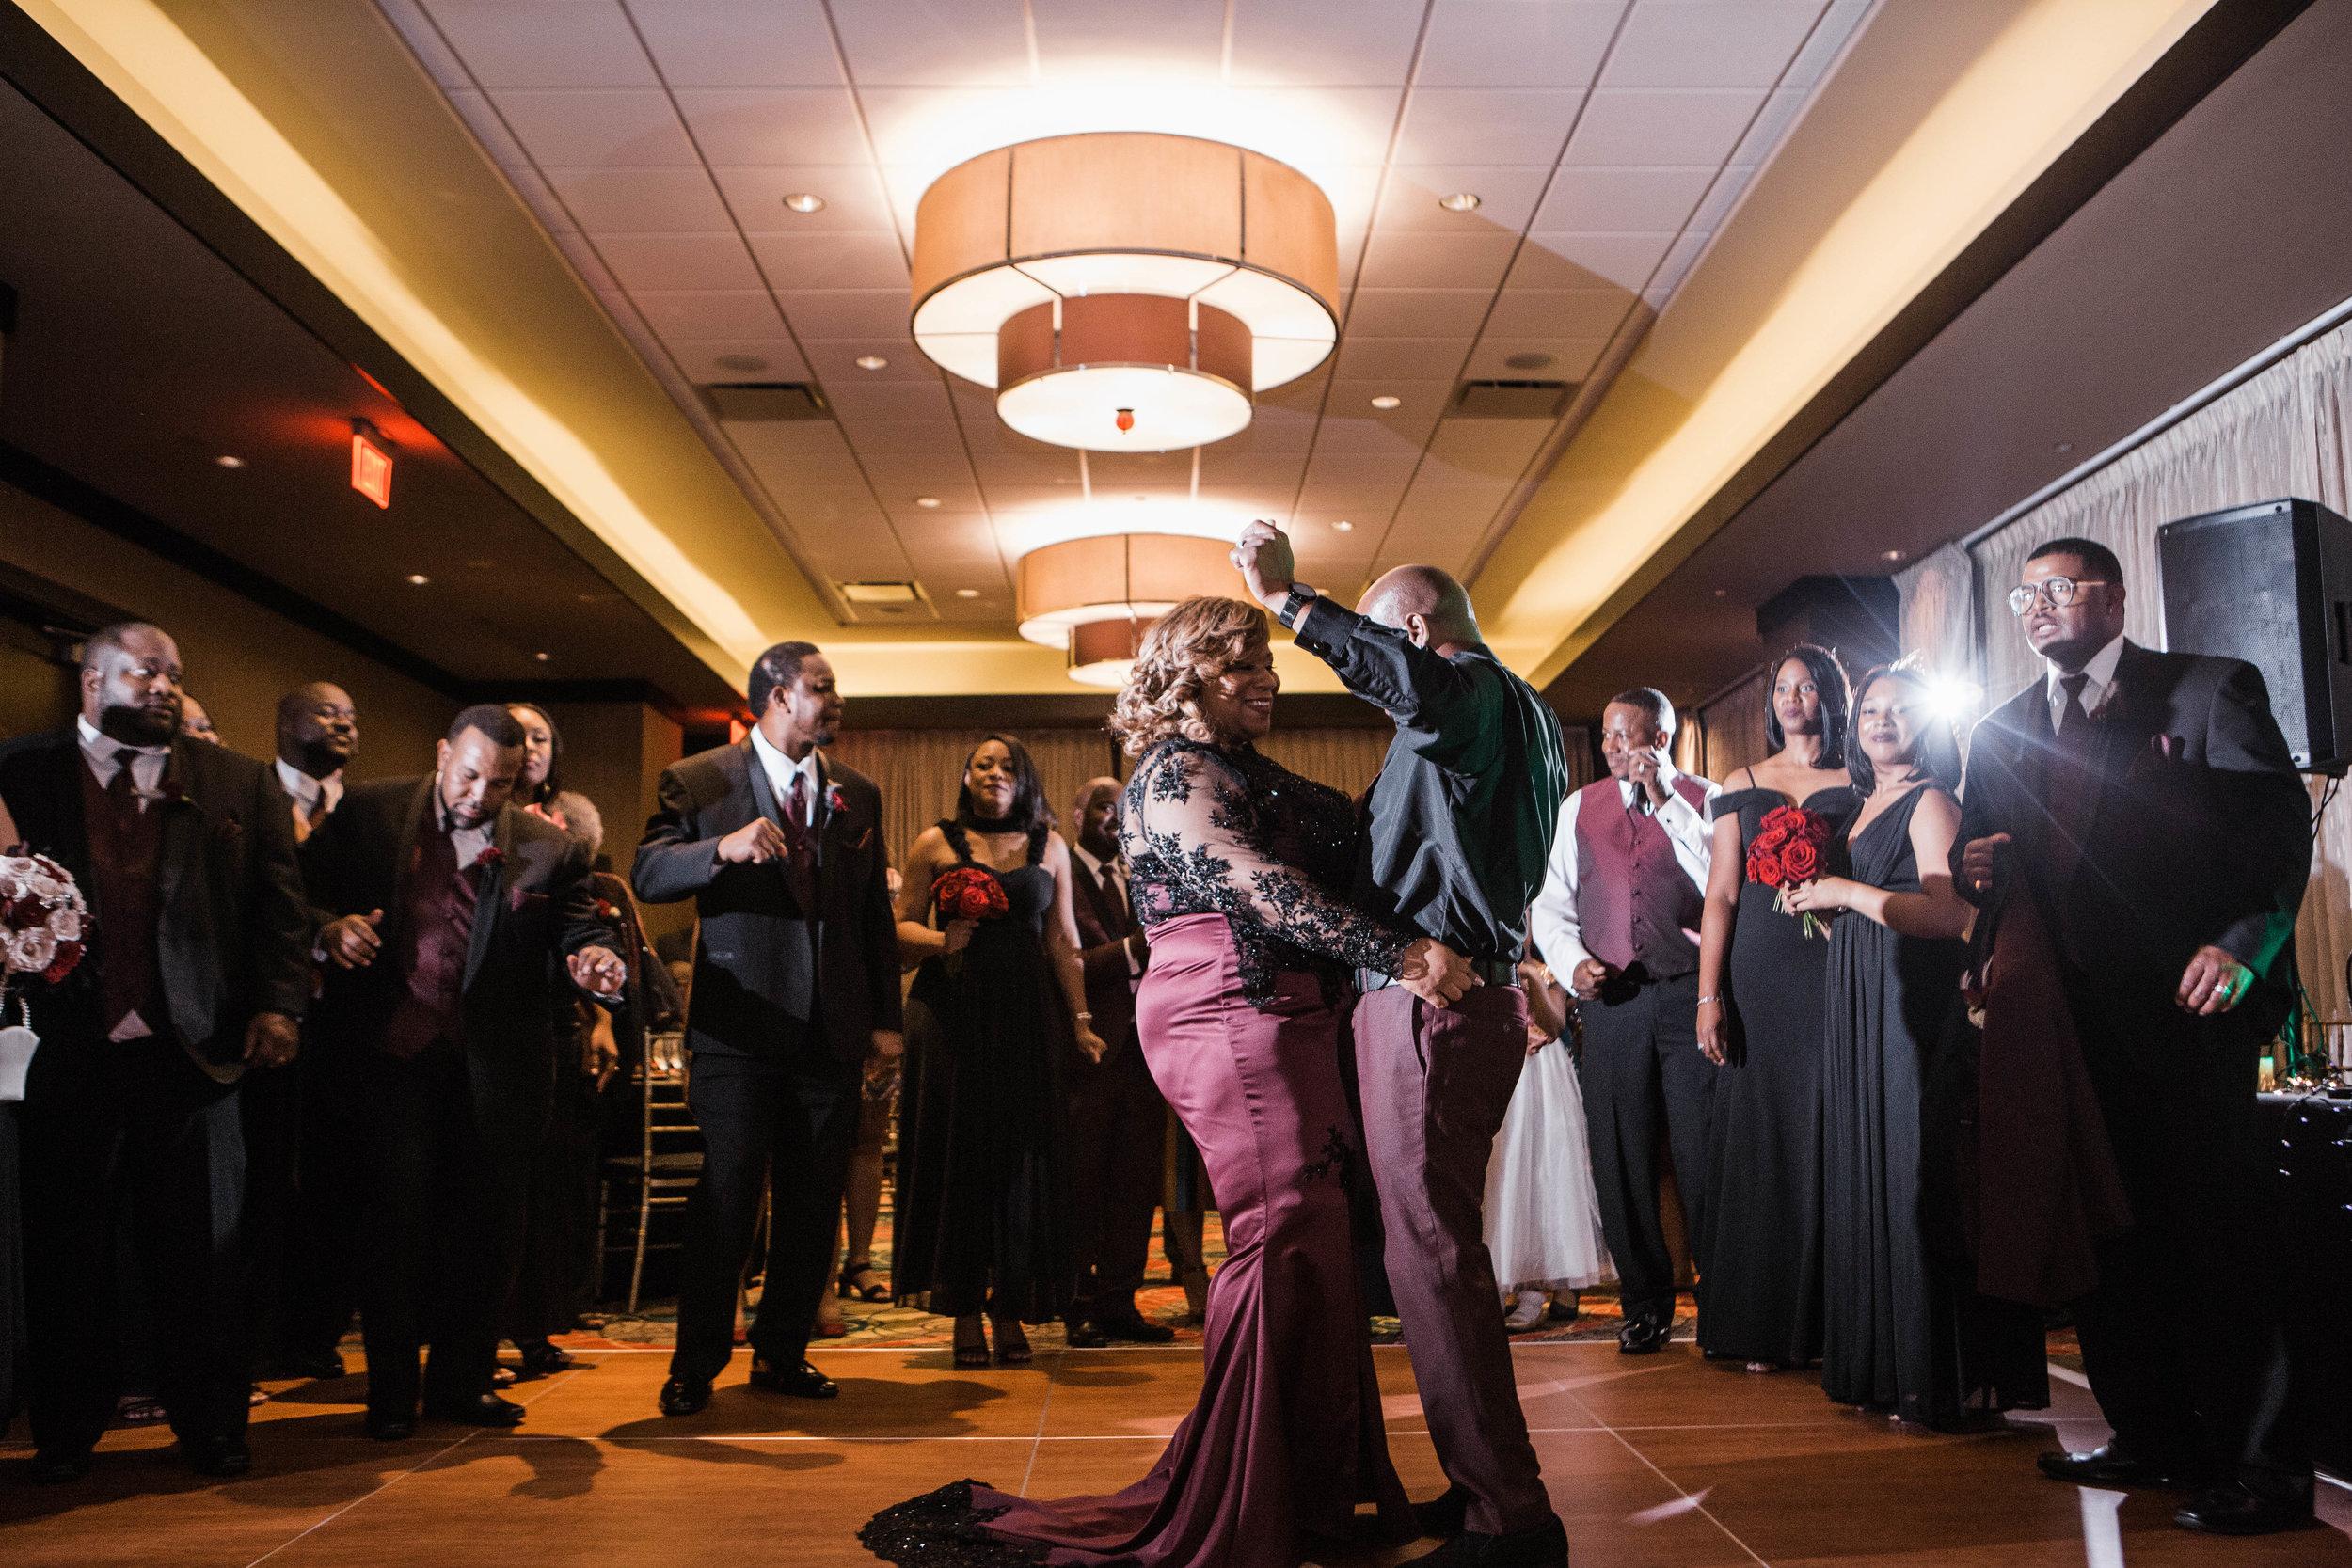 Wedding reception at Golden Nugget Lake Charles Hotel & Casino